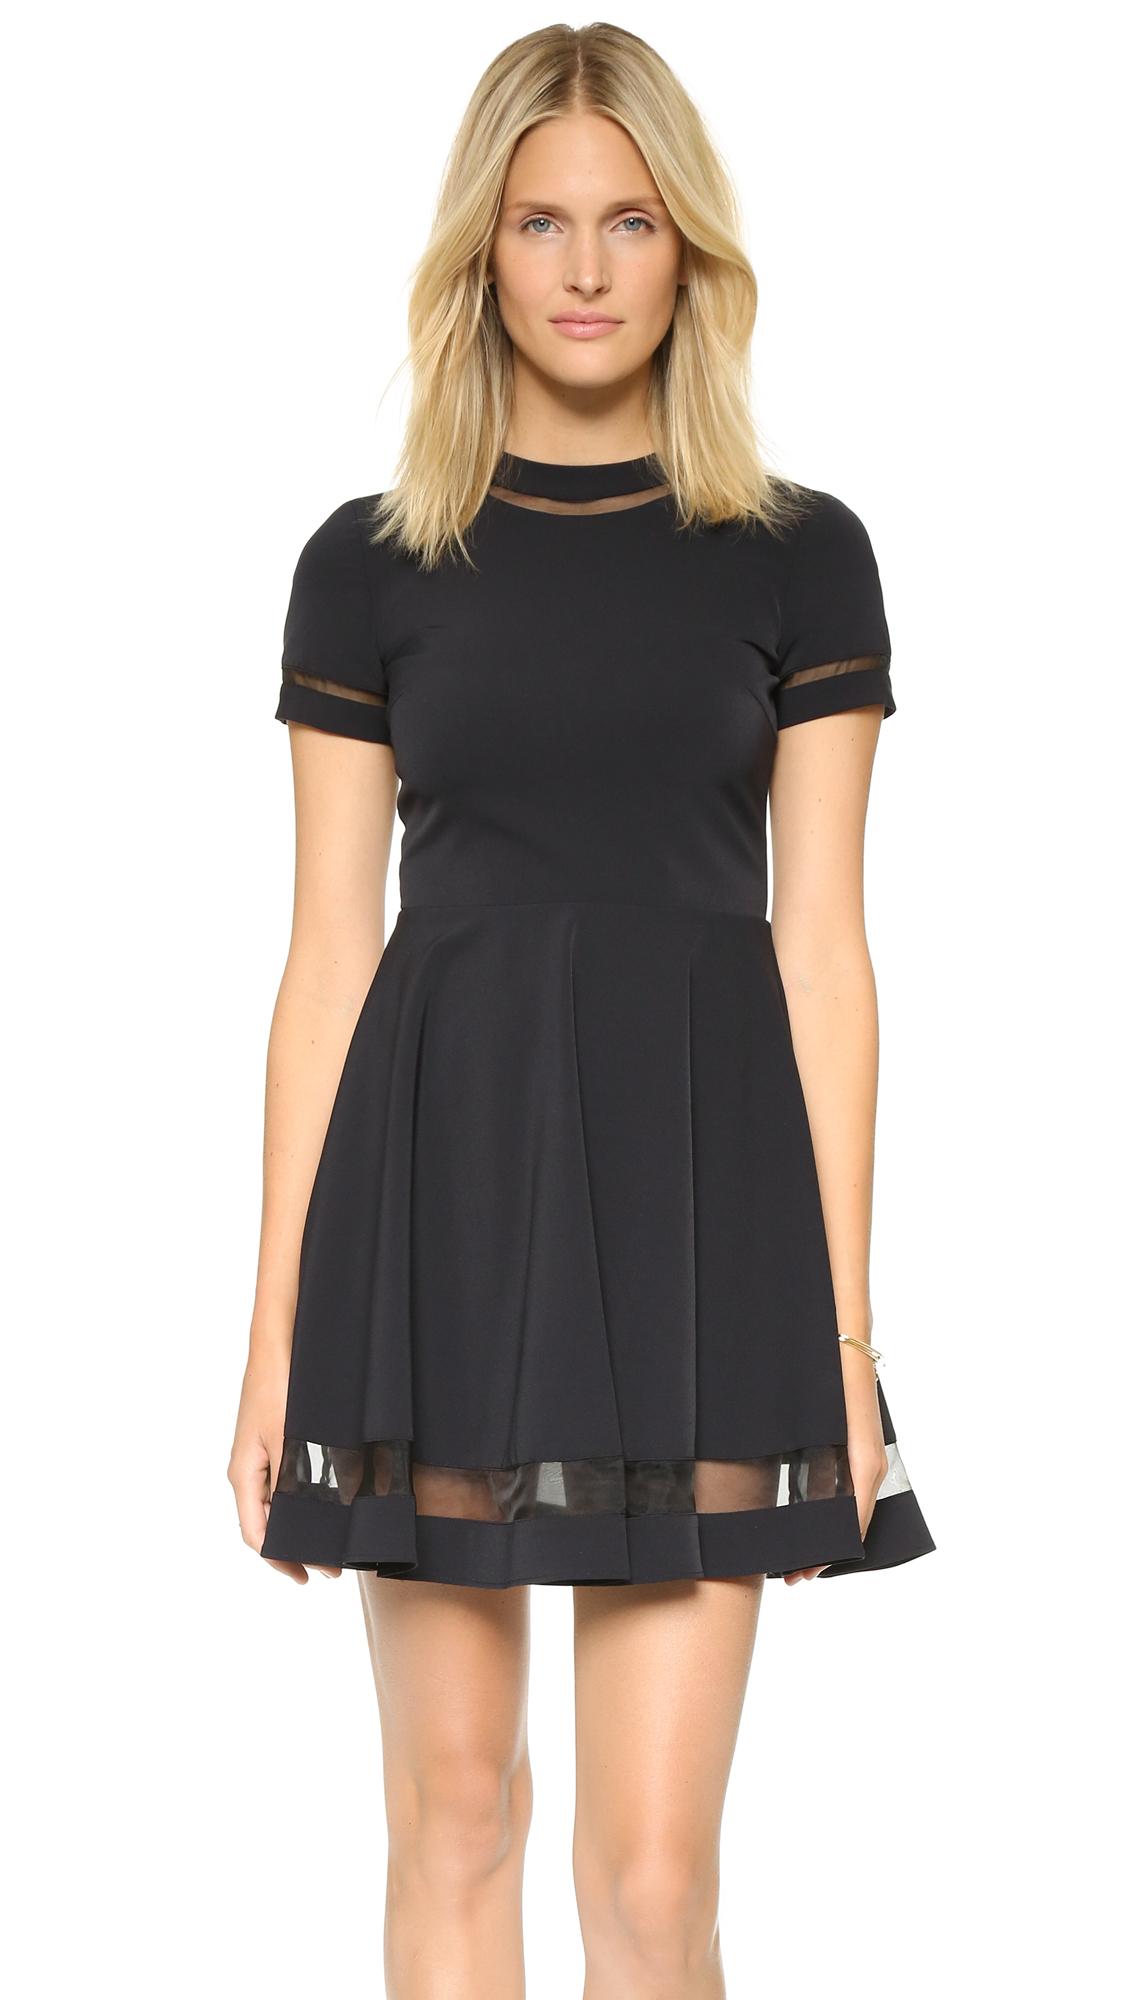 Alice + Olivia Frances Mini Flared Dress - Black at Shopbop